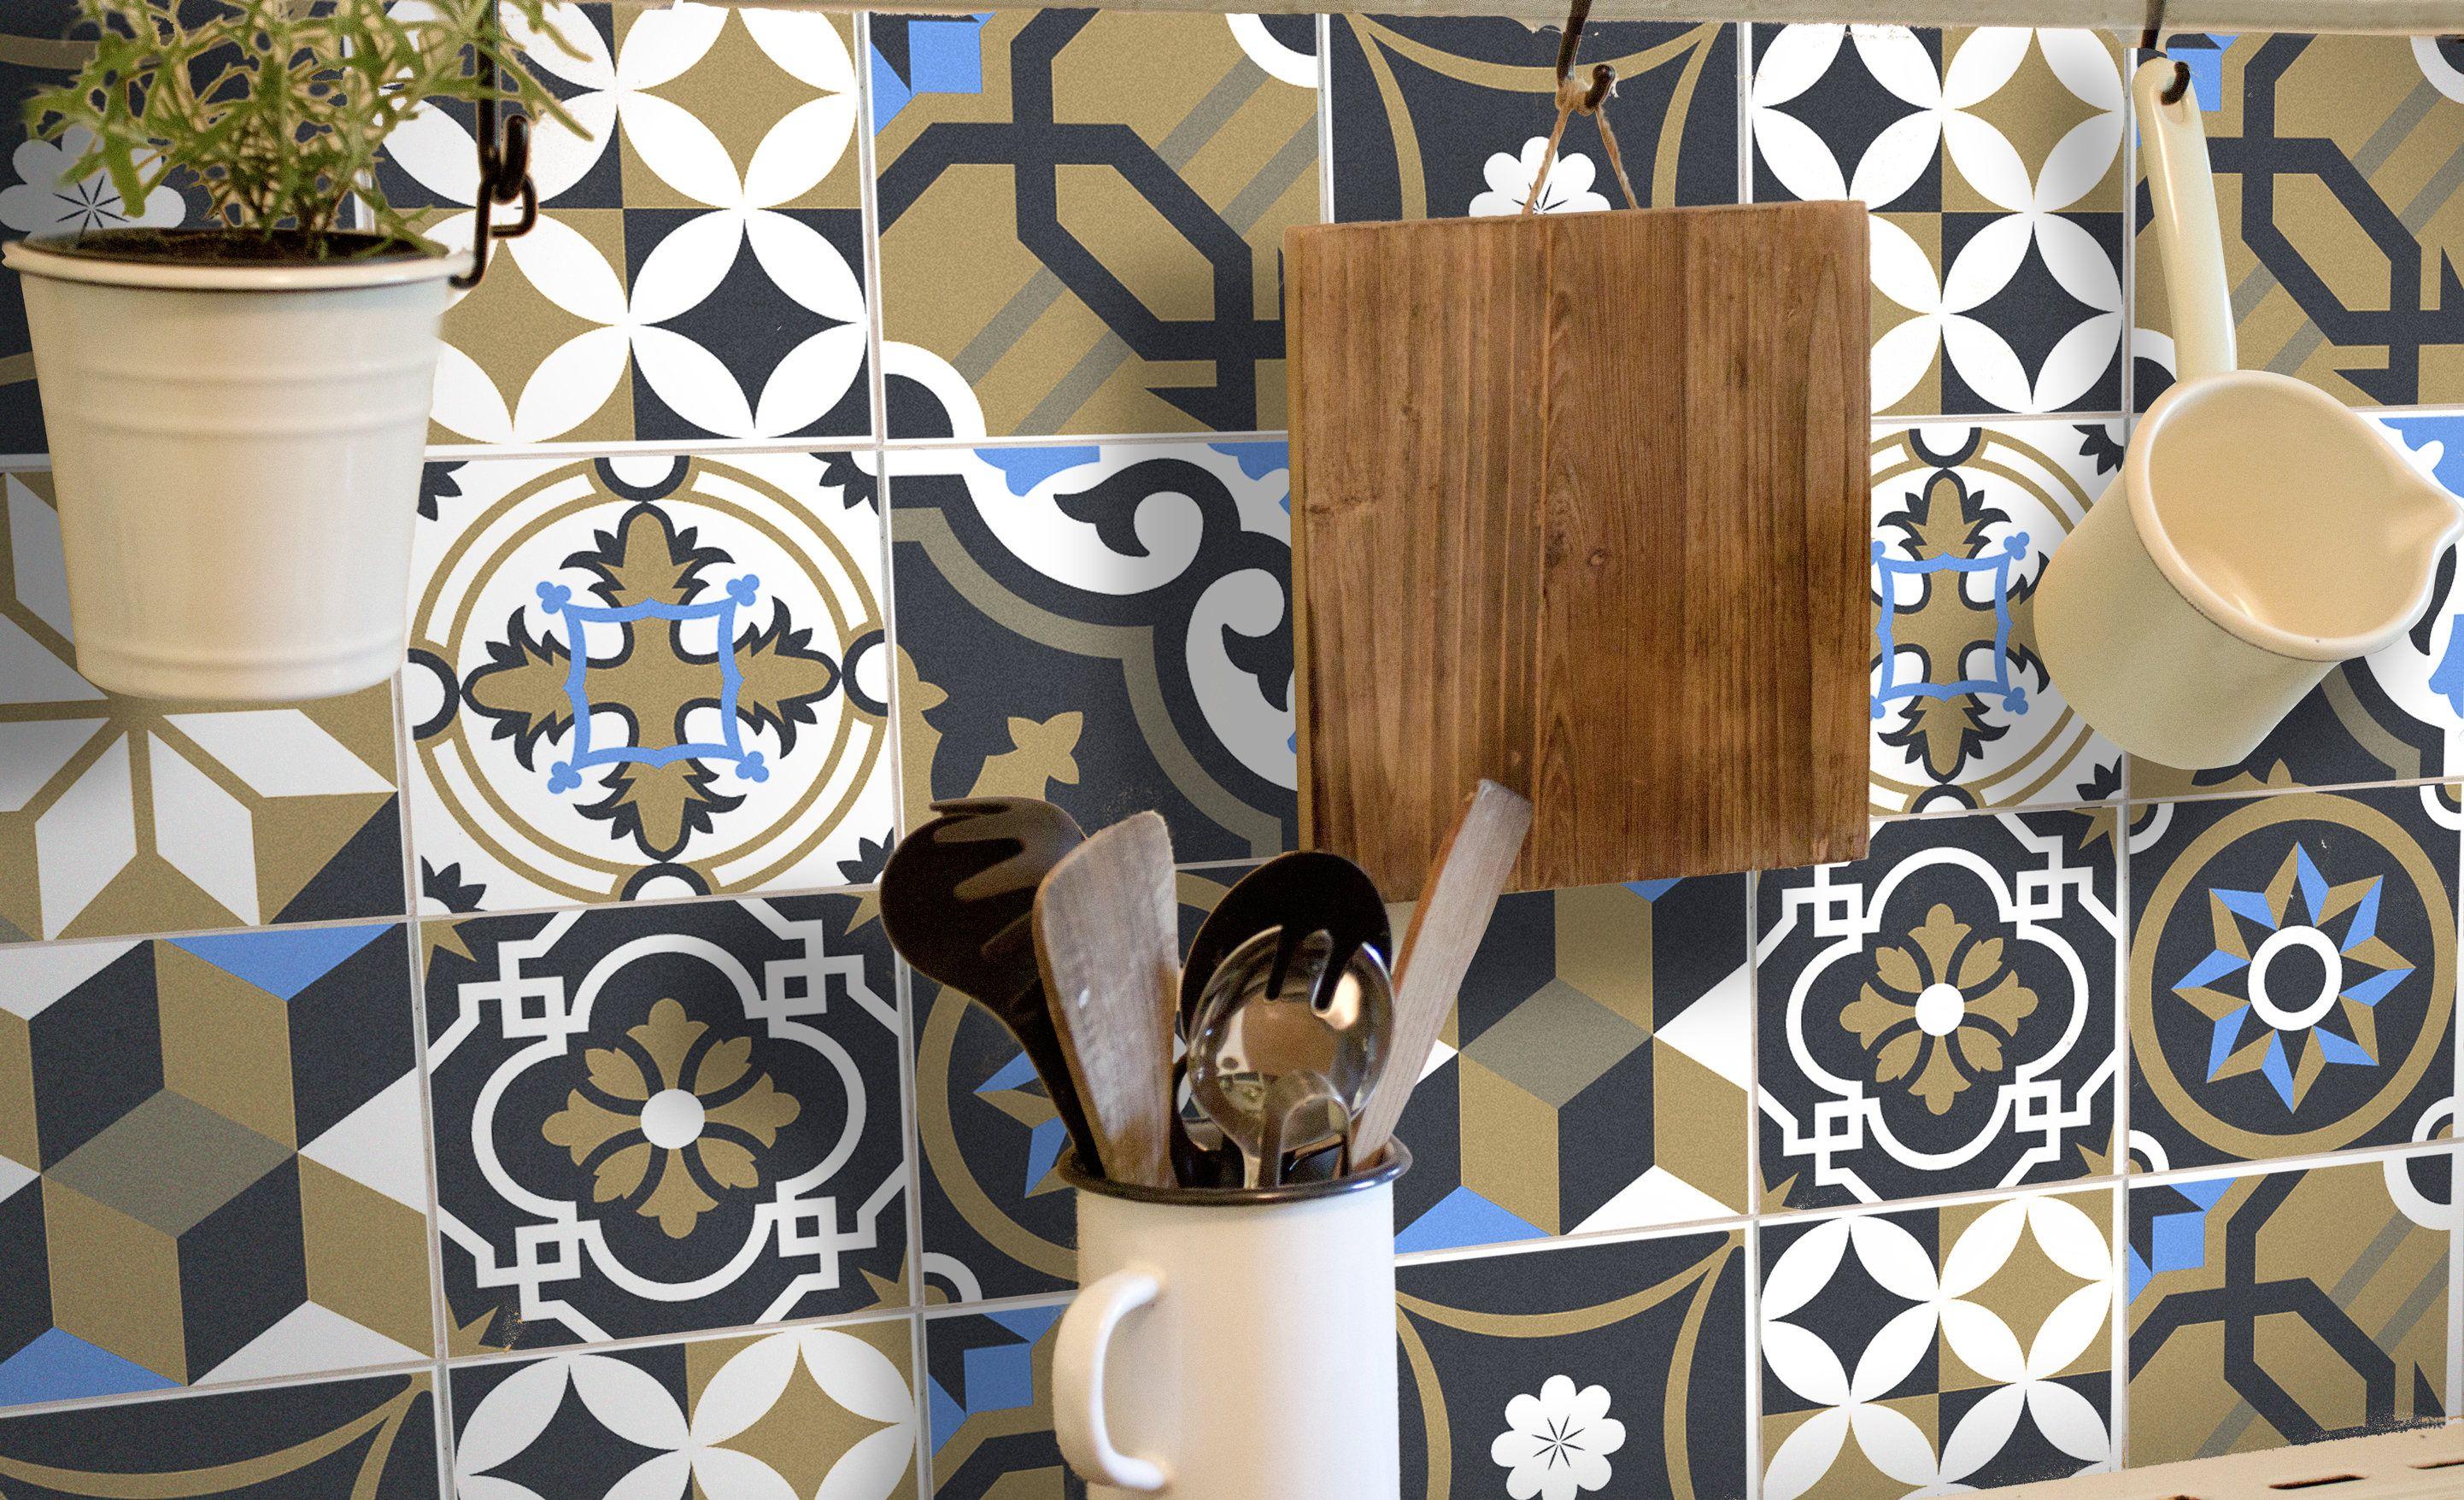 Tile Decals Tile Sticker Vinyl Tiles Kitchen Tile Decals Patchwork Portuguese Fliesenfolie Wandfarbe Kuche Fliesenaufkleber